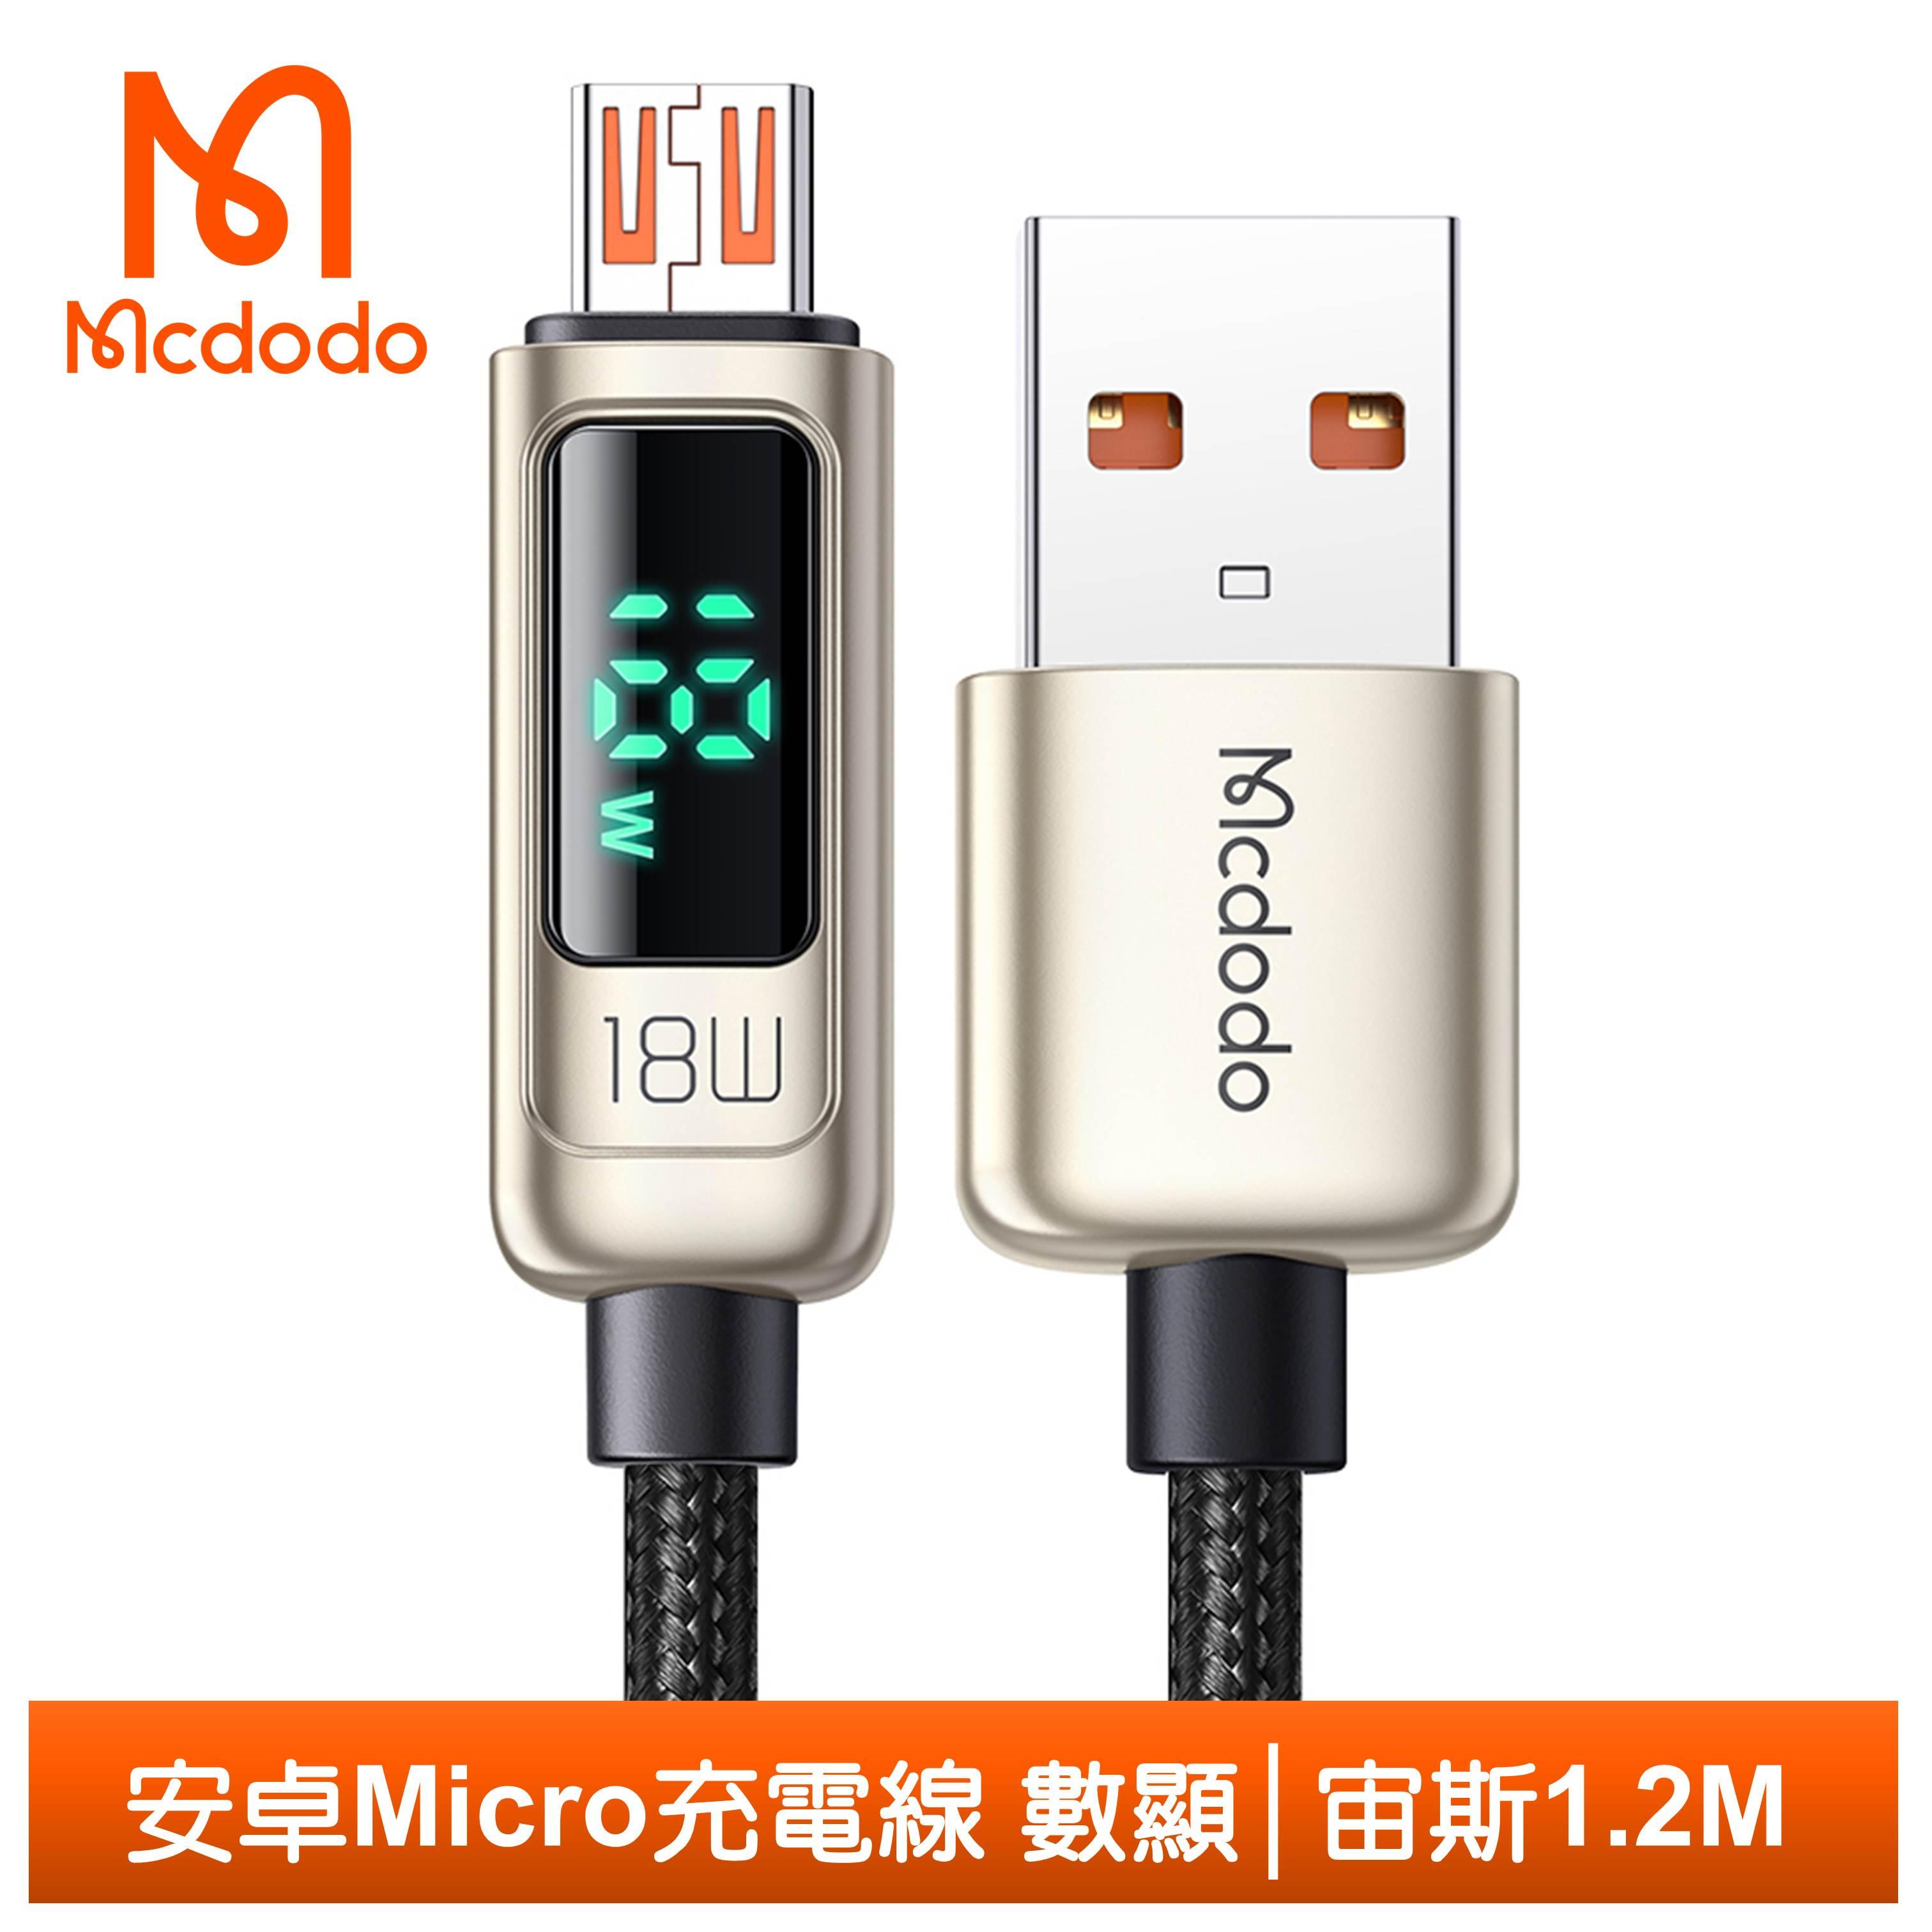 Mcdodo麥多多台灣官方 安卓MicroUSB充電線傳輸線閃充線編織快充 QC4.0 功率數顯 宙斯 1.2M 銀色